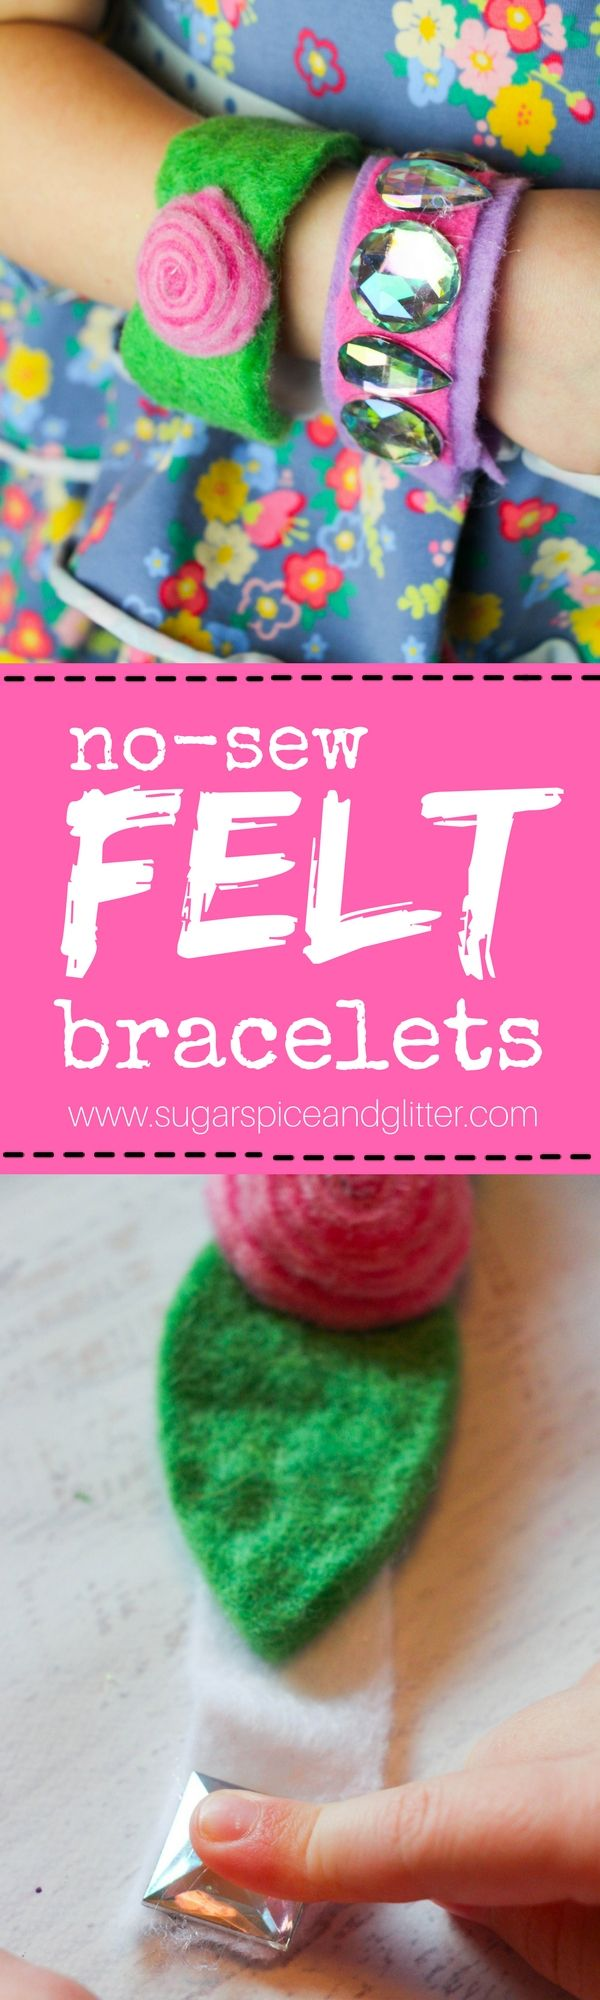 Kid-made Felt Bracelets, an easy no-sew homemade jewelry craft for kids #craft #kidscraft